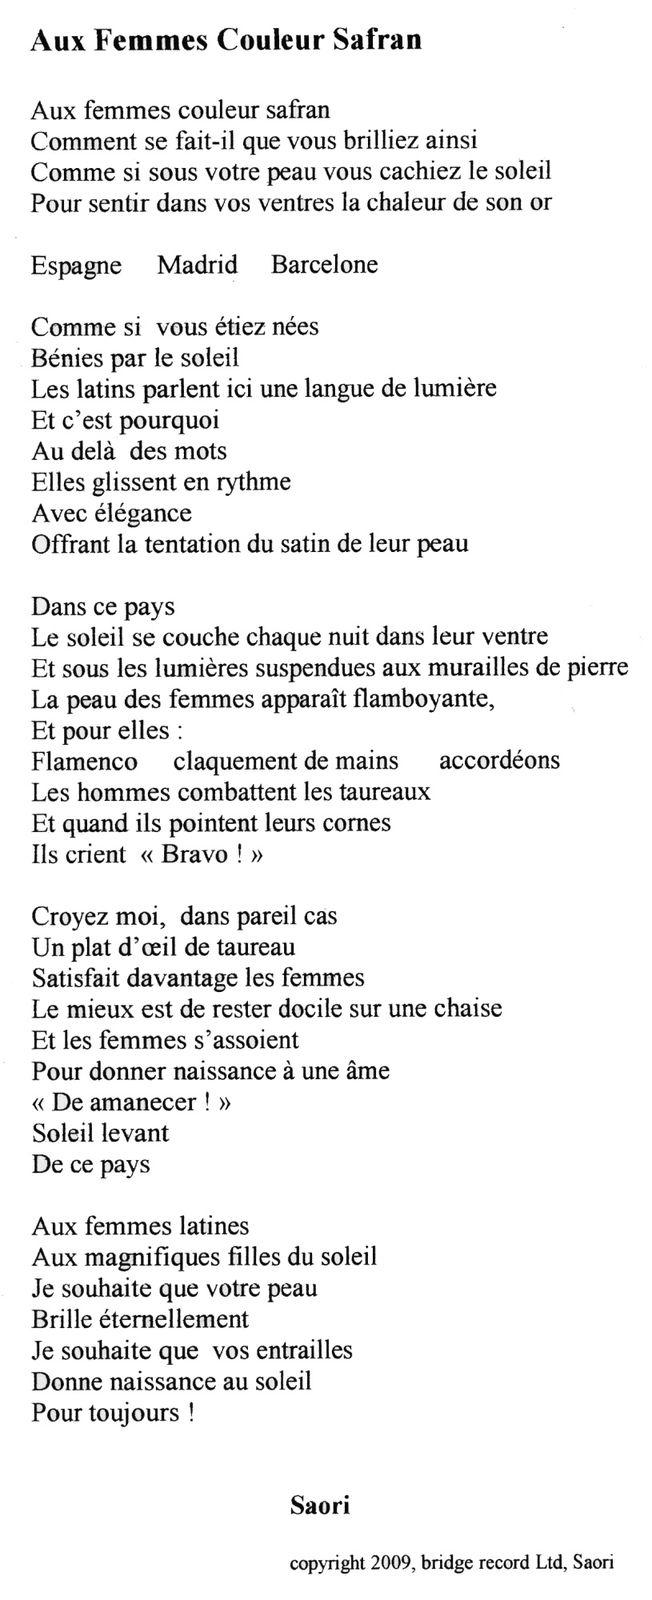 poemes_saori_1.jpg